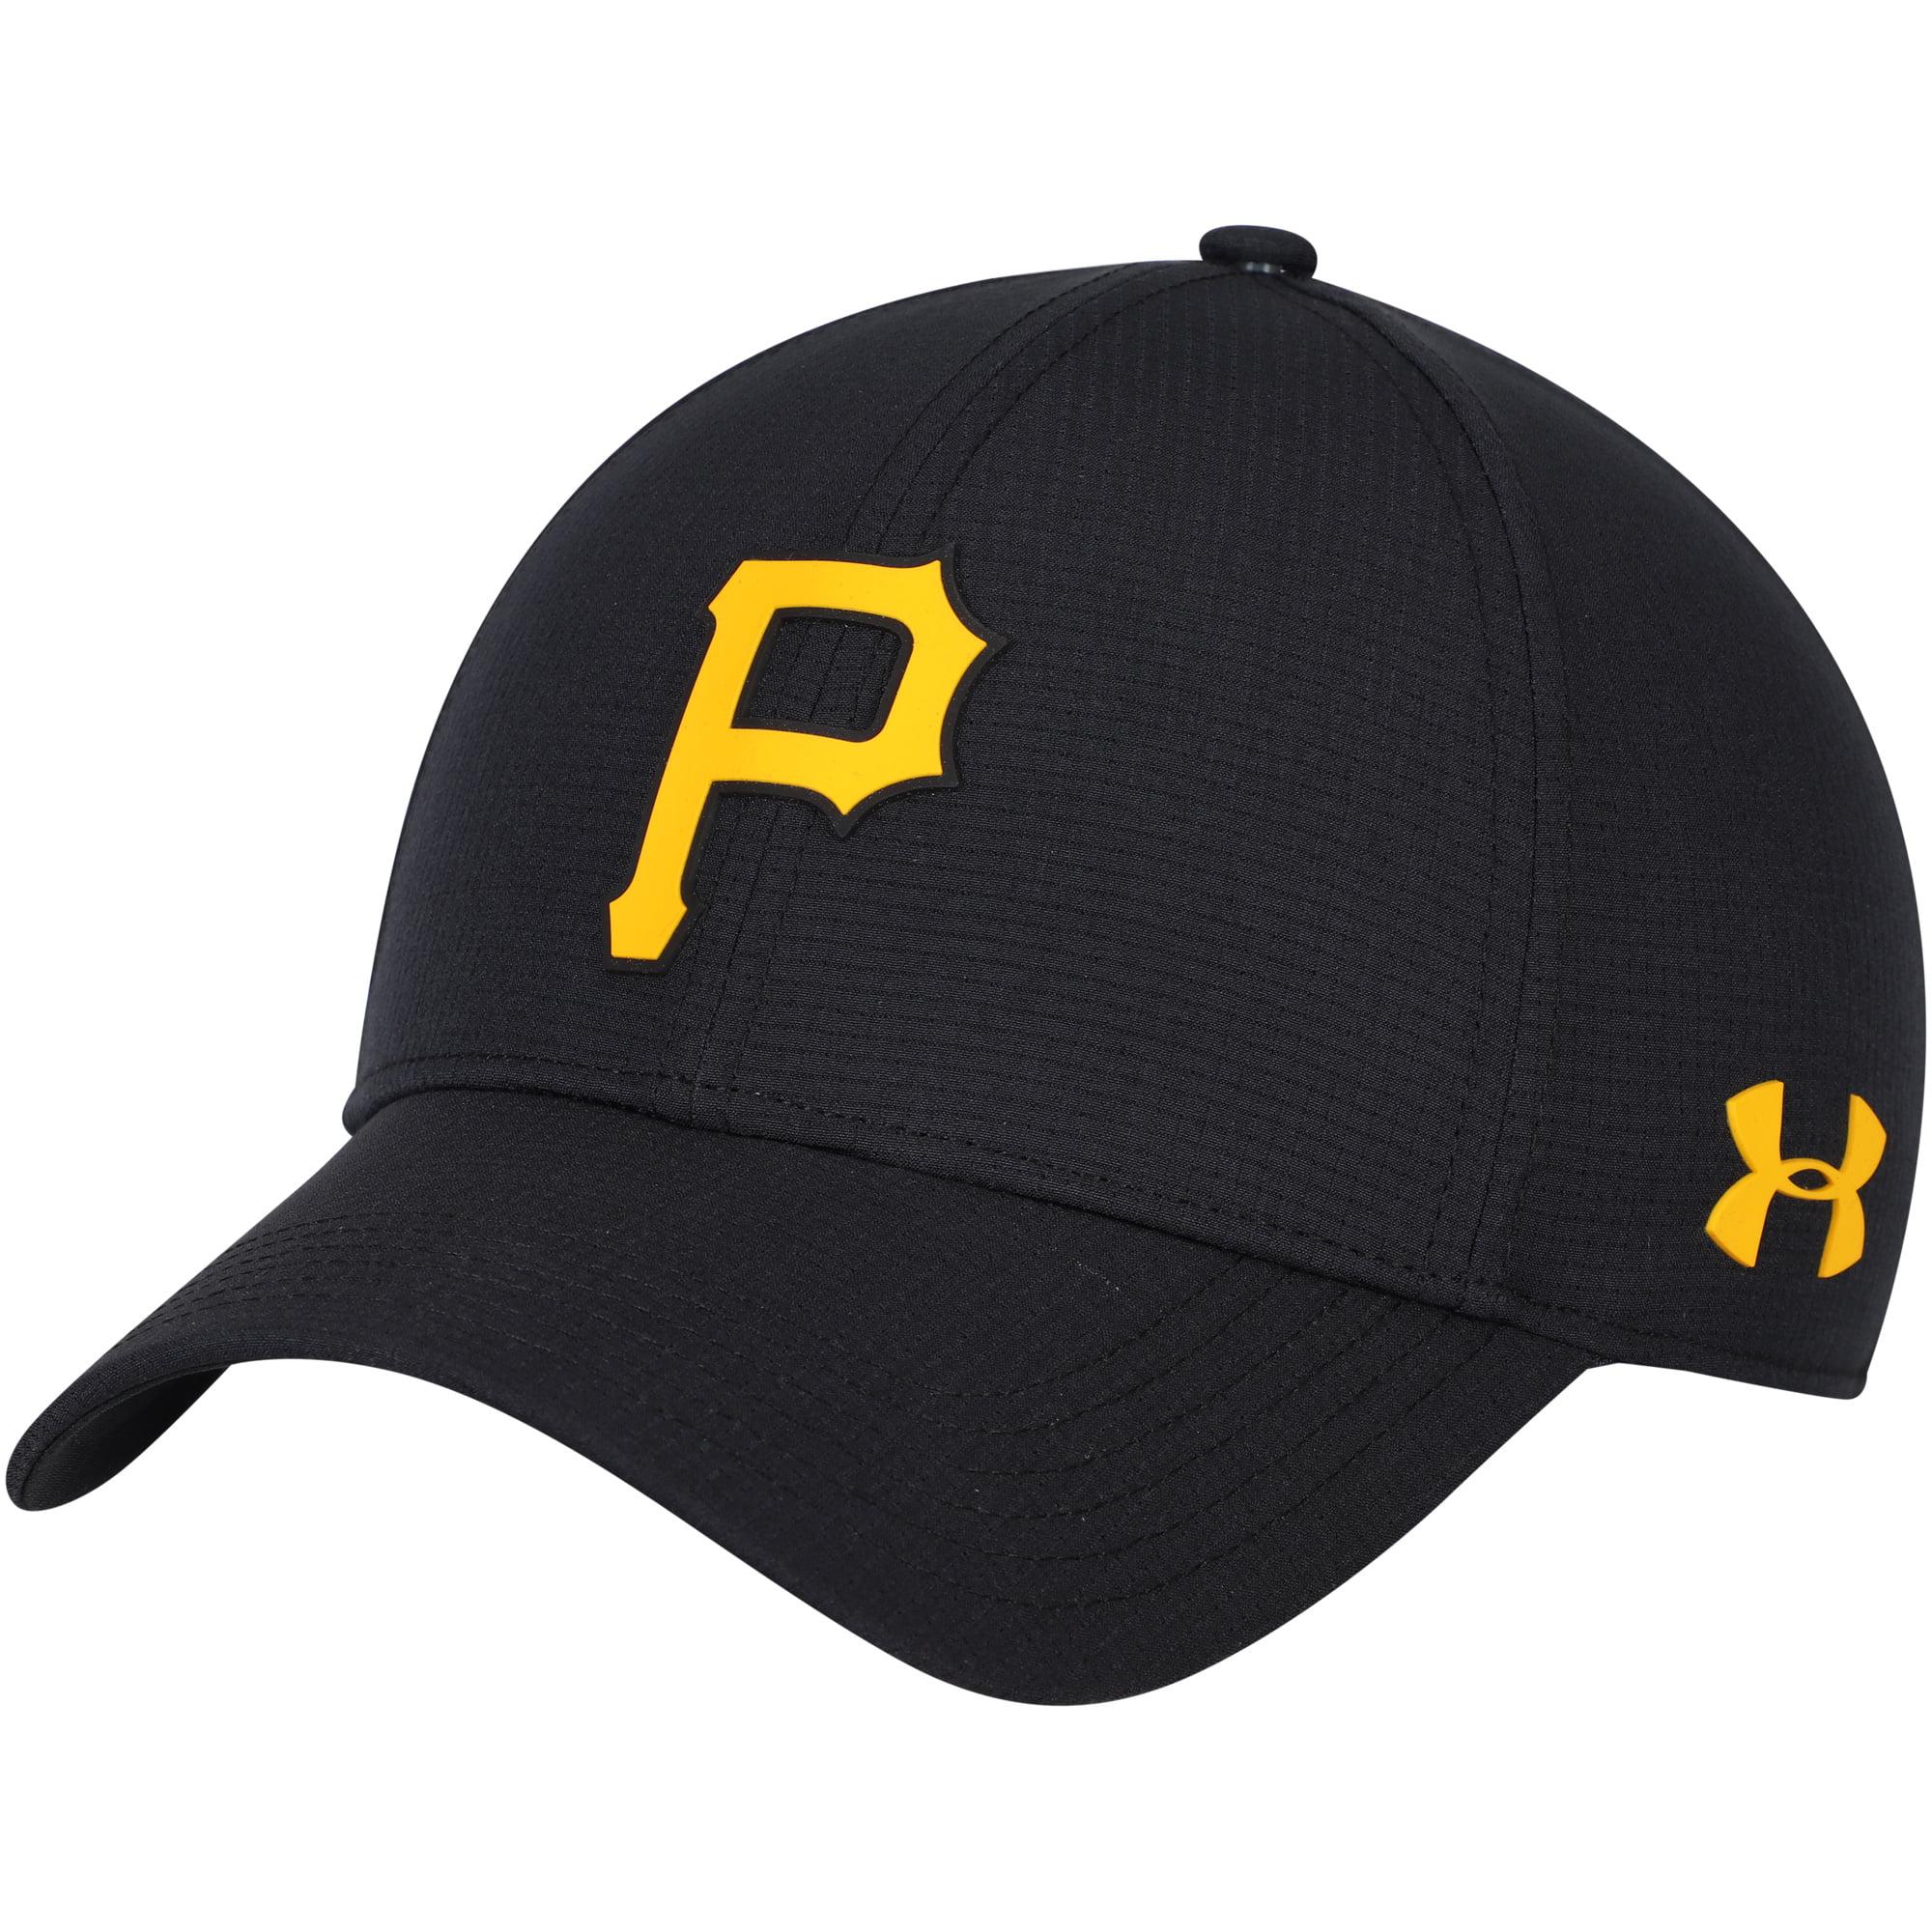 Pittsburgh Pirates Under Armour MLB Driver Cap 2.0 Adjustable Hat - Black - OSFA